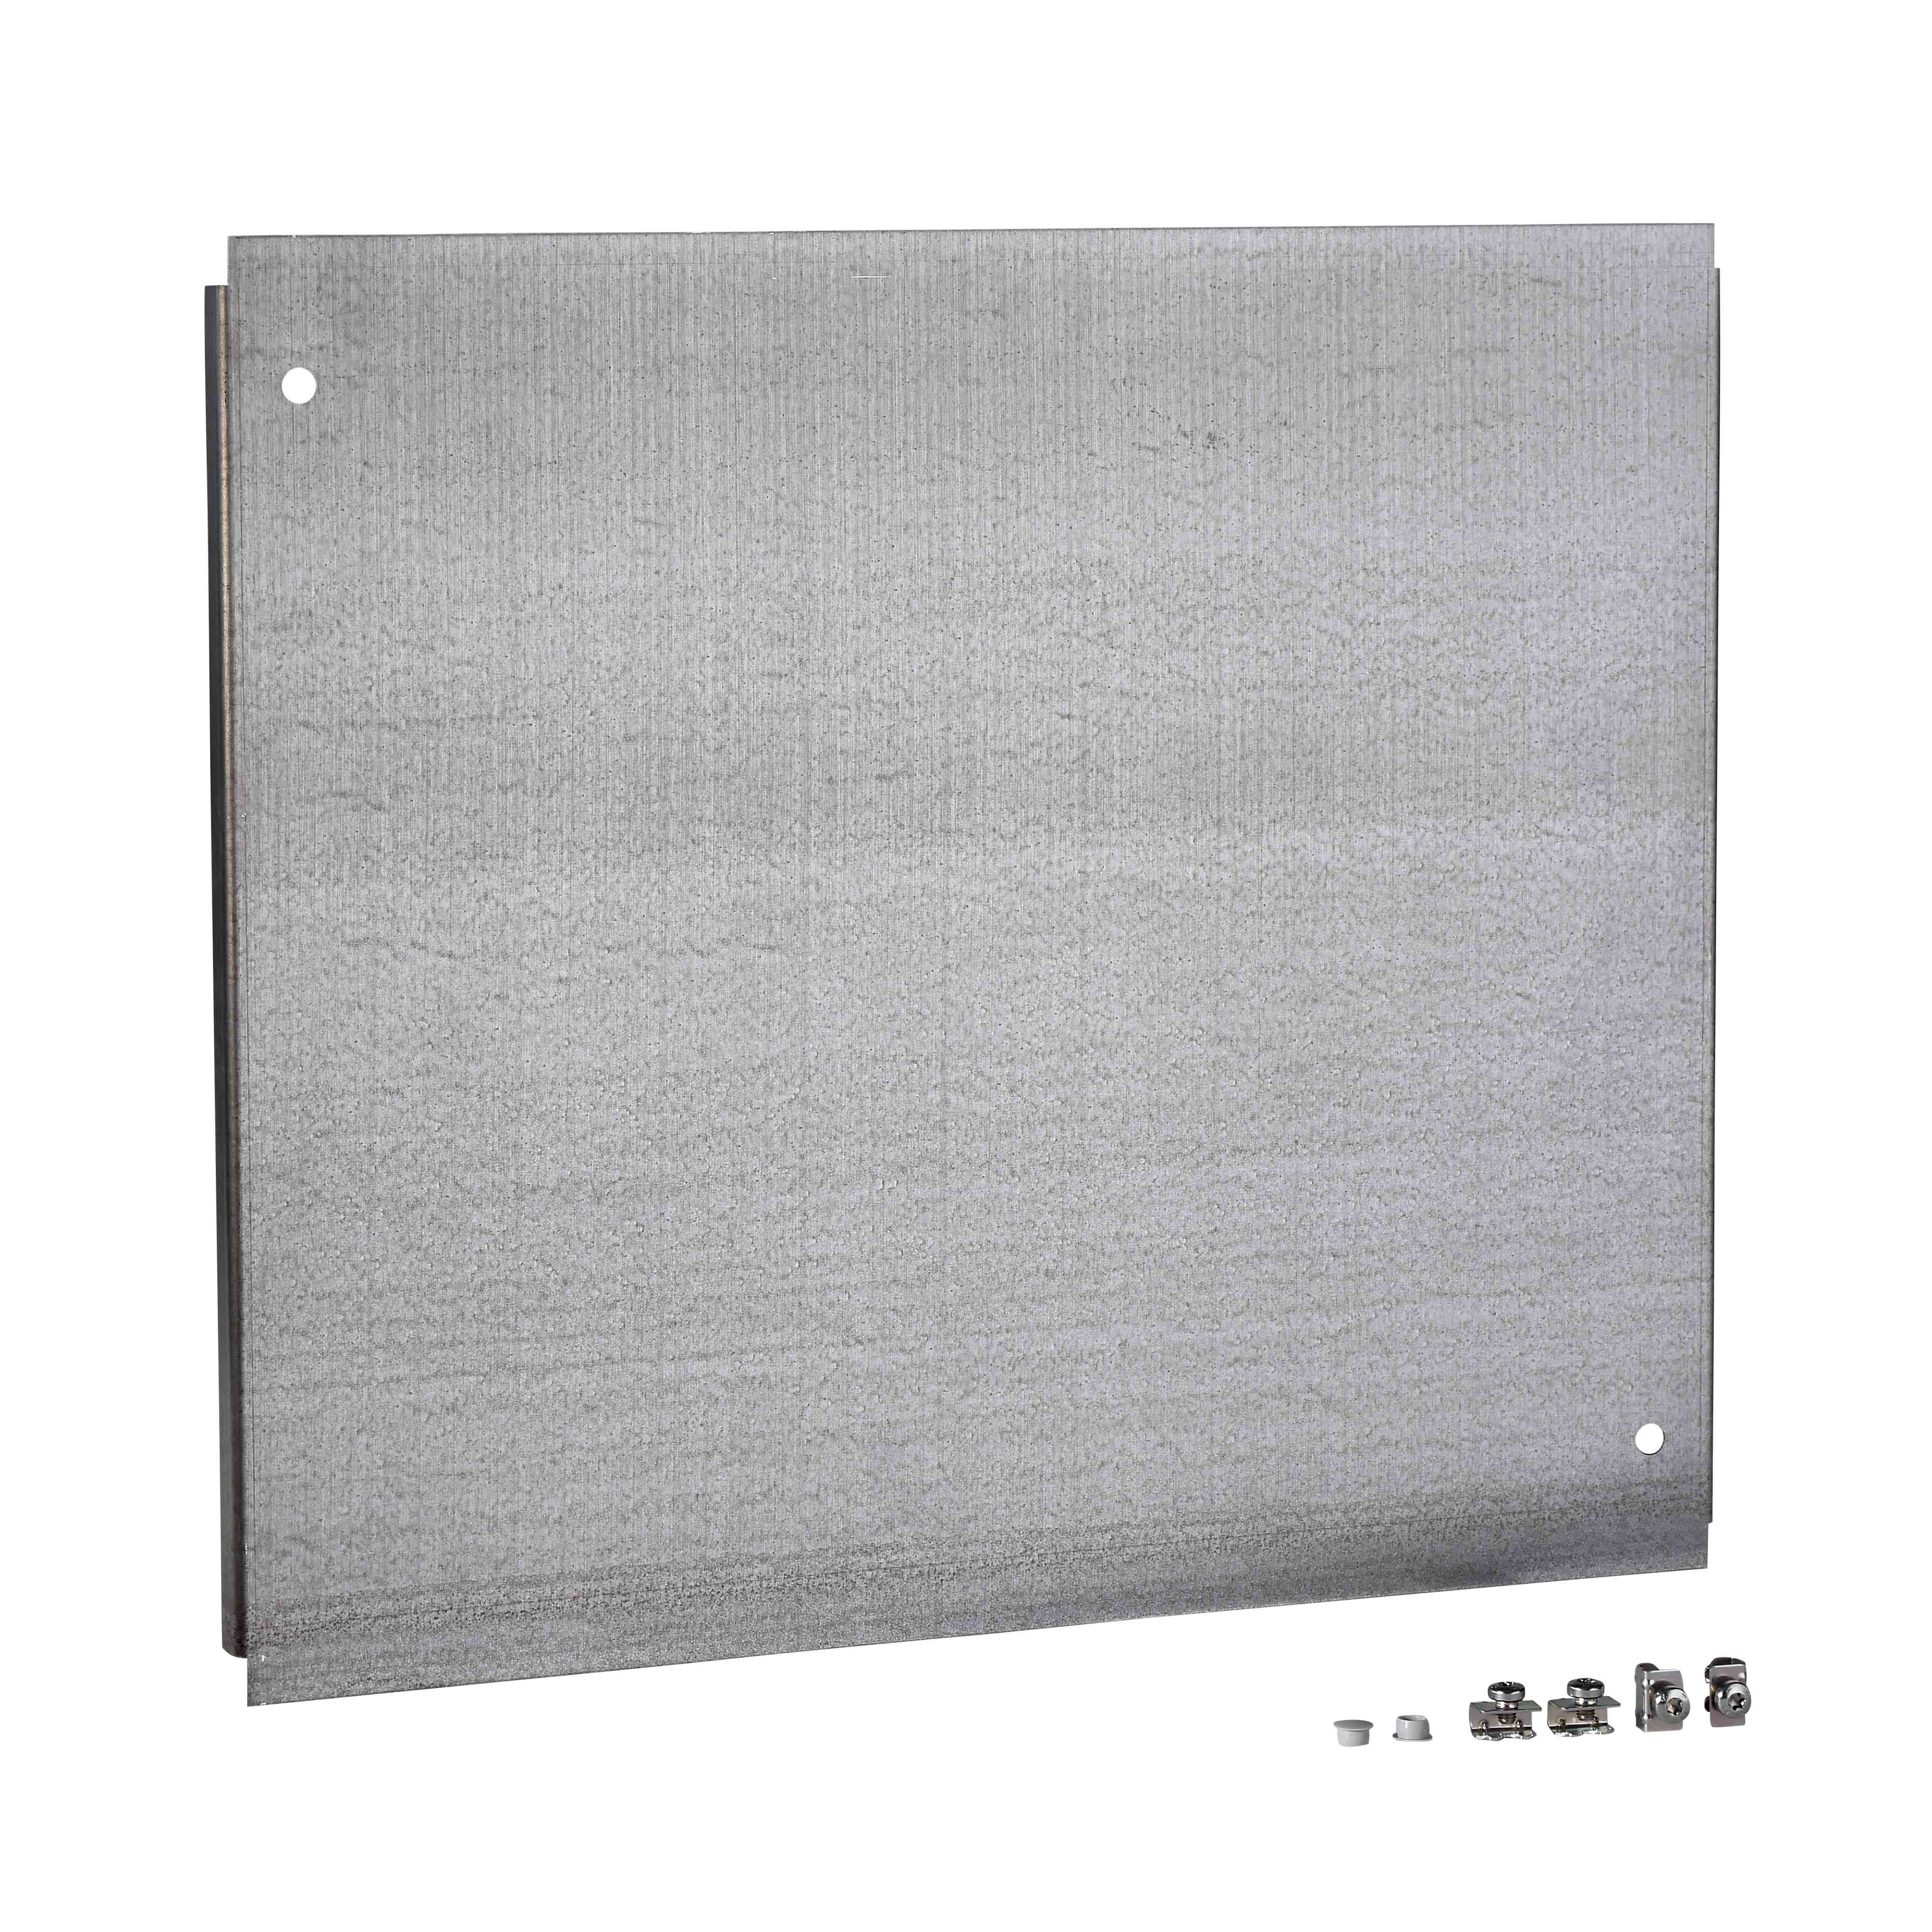 Spacial SF navadna plošča kab. uvodnice - pritr. s sponkami - 1000 x 400 mm